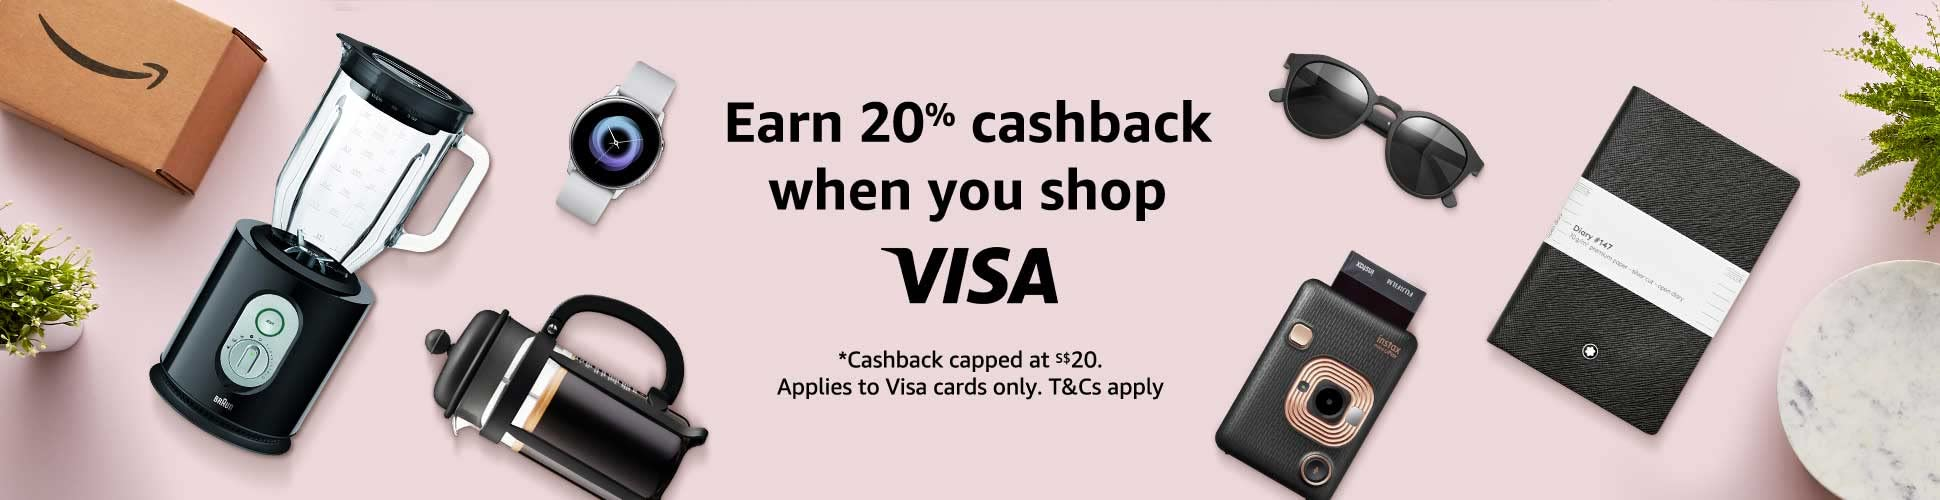 Visa August Promotion